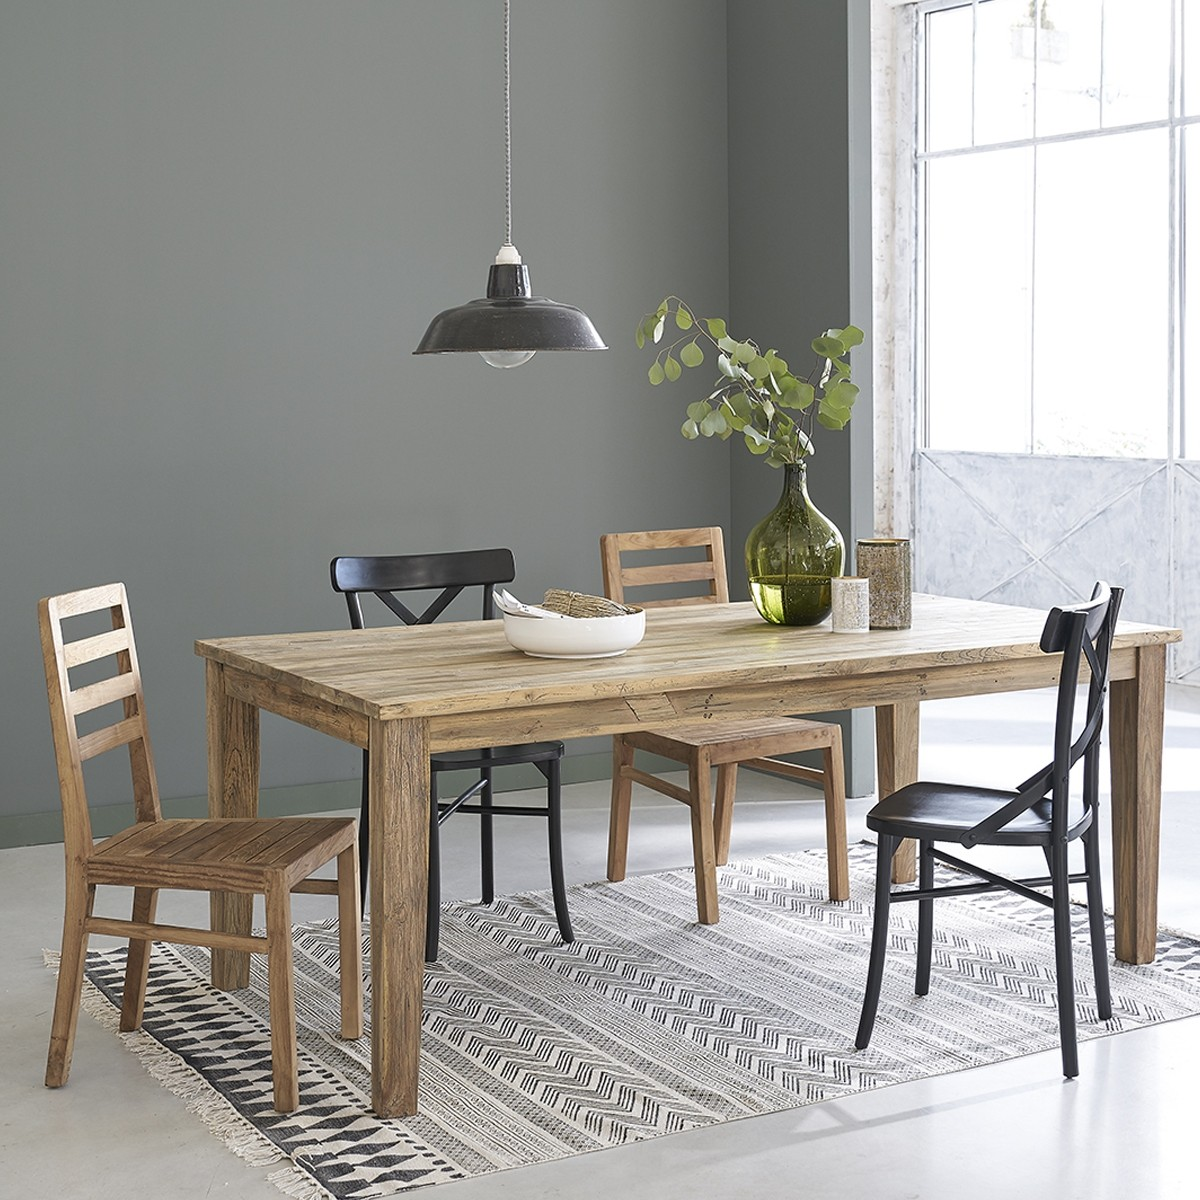 table extensible en bois de teck recycle 12 personnes cargo